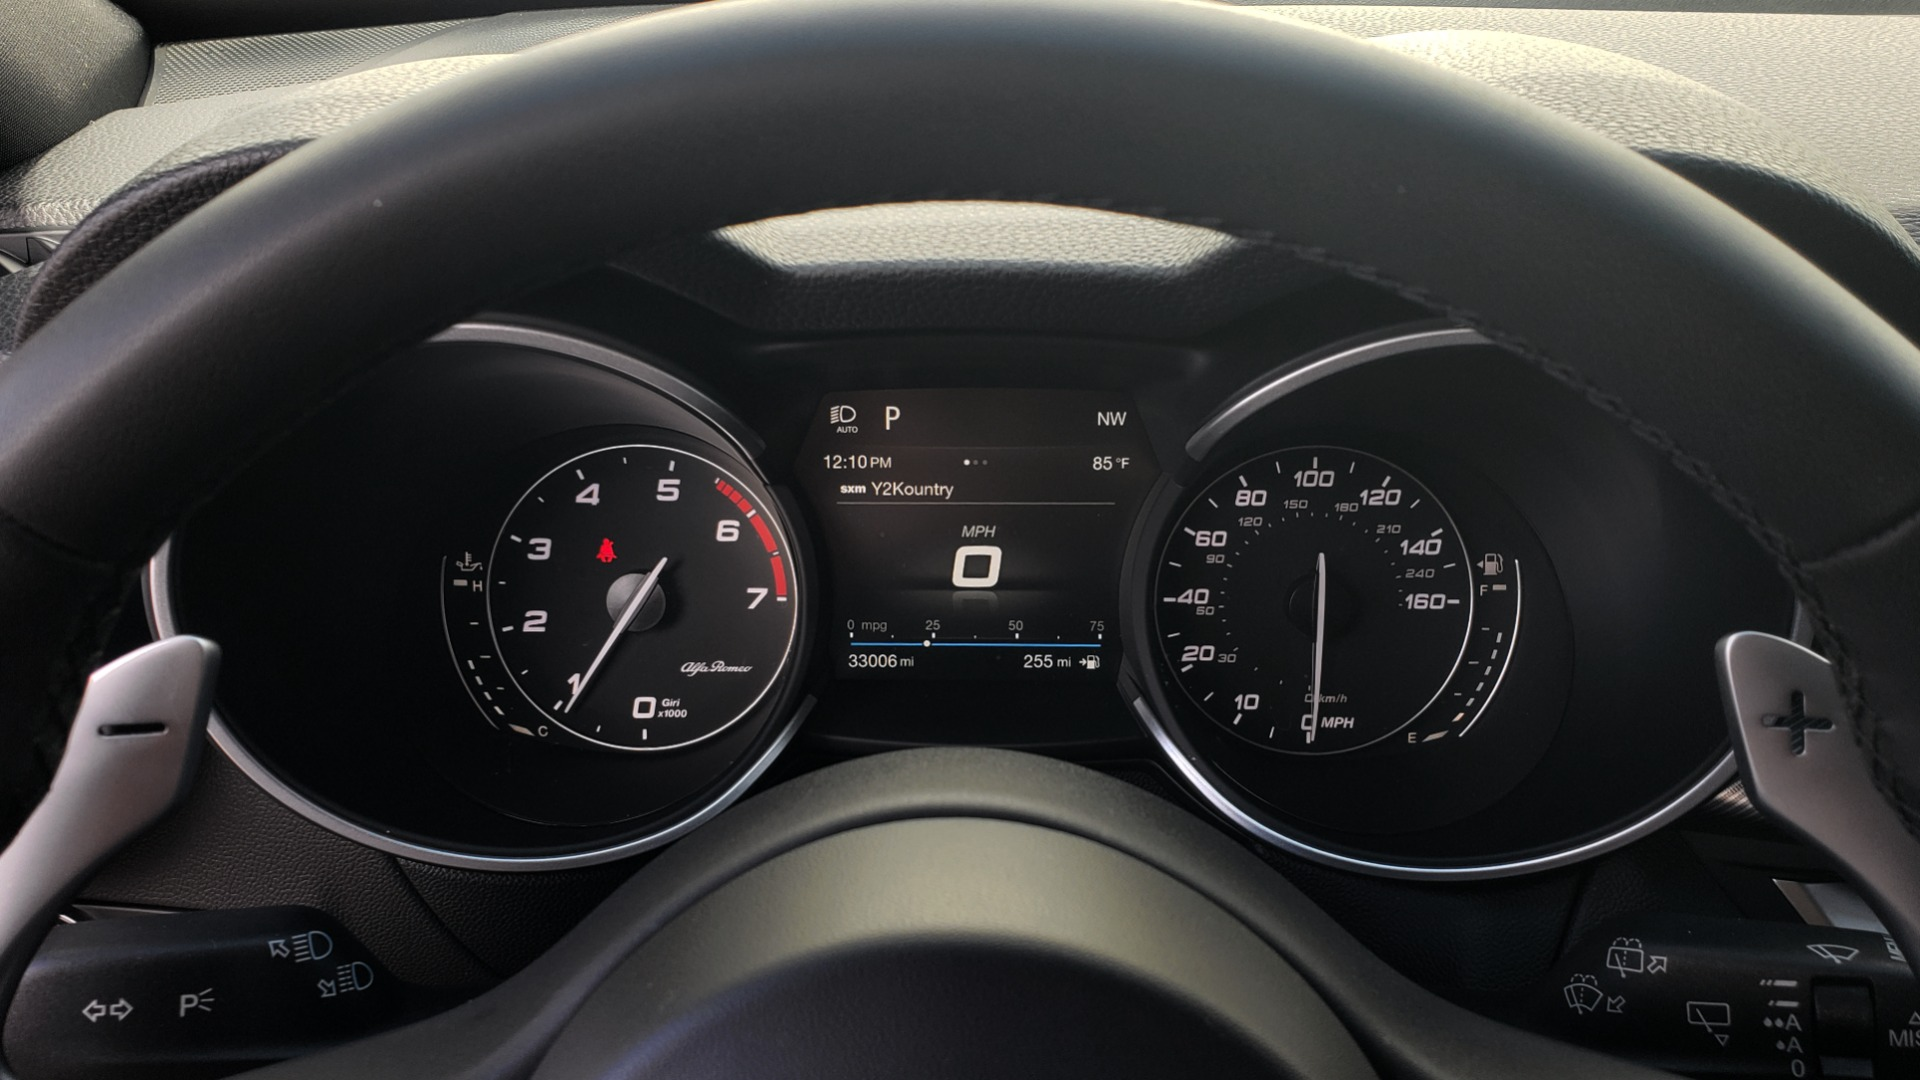 Used 2019 Alfa Romeo STELVIO TI SPORT AWD / 2.0L TURBO / 8-SPD AUTO / DRVR ASST / REARVIEW for sale $37,495 at Formula Imports in Charlotte NC 28227 47